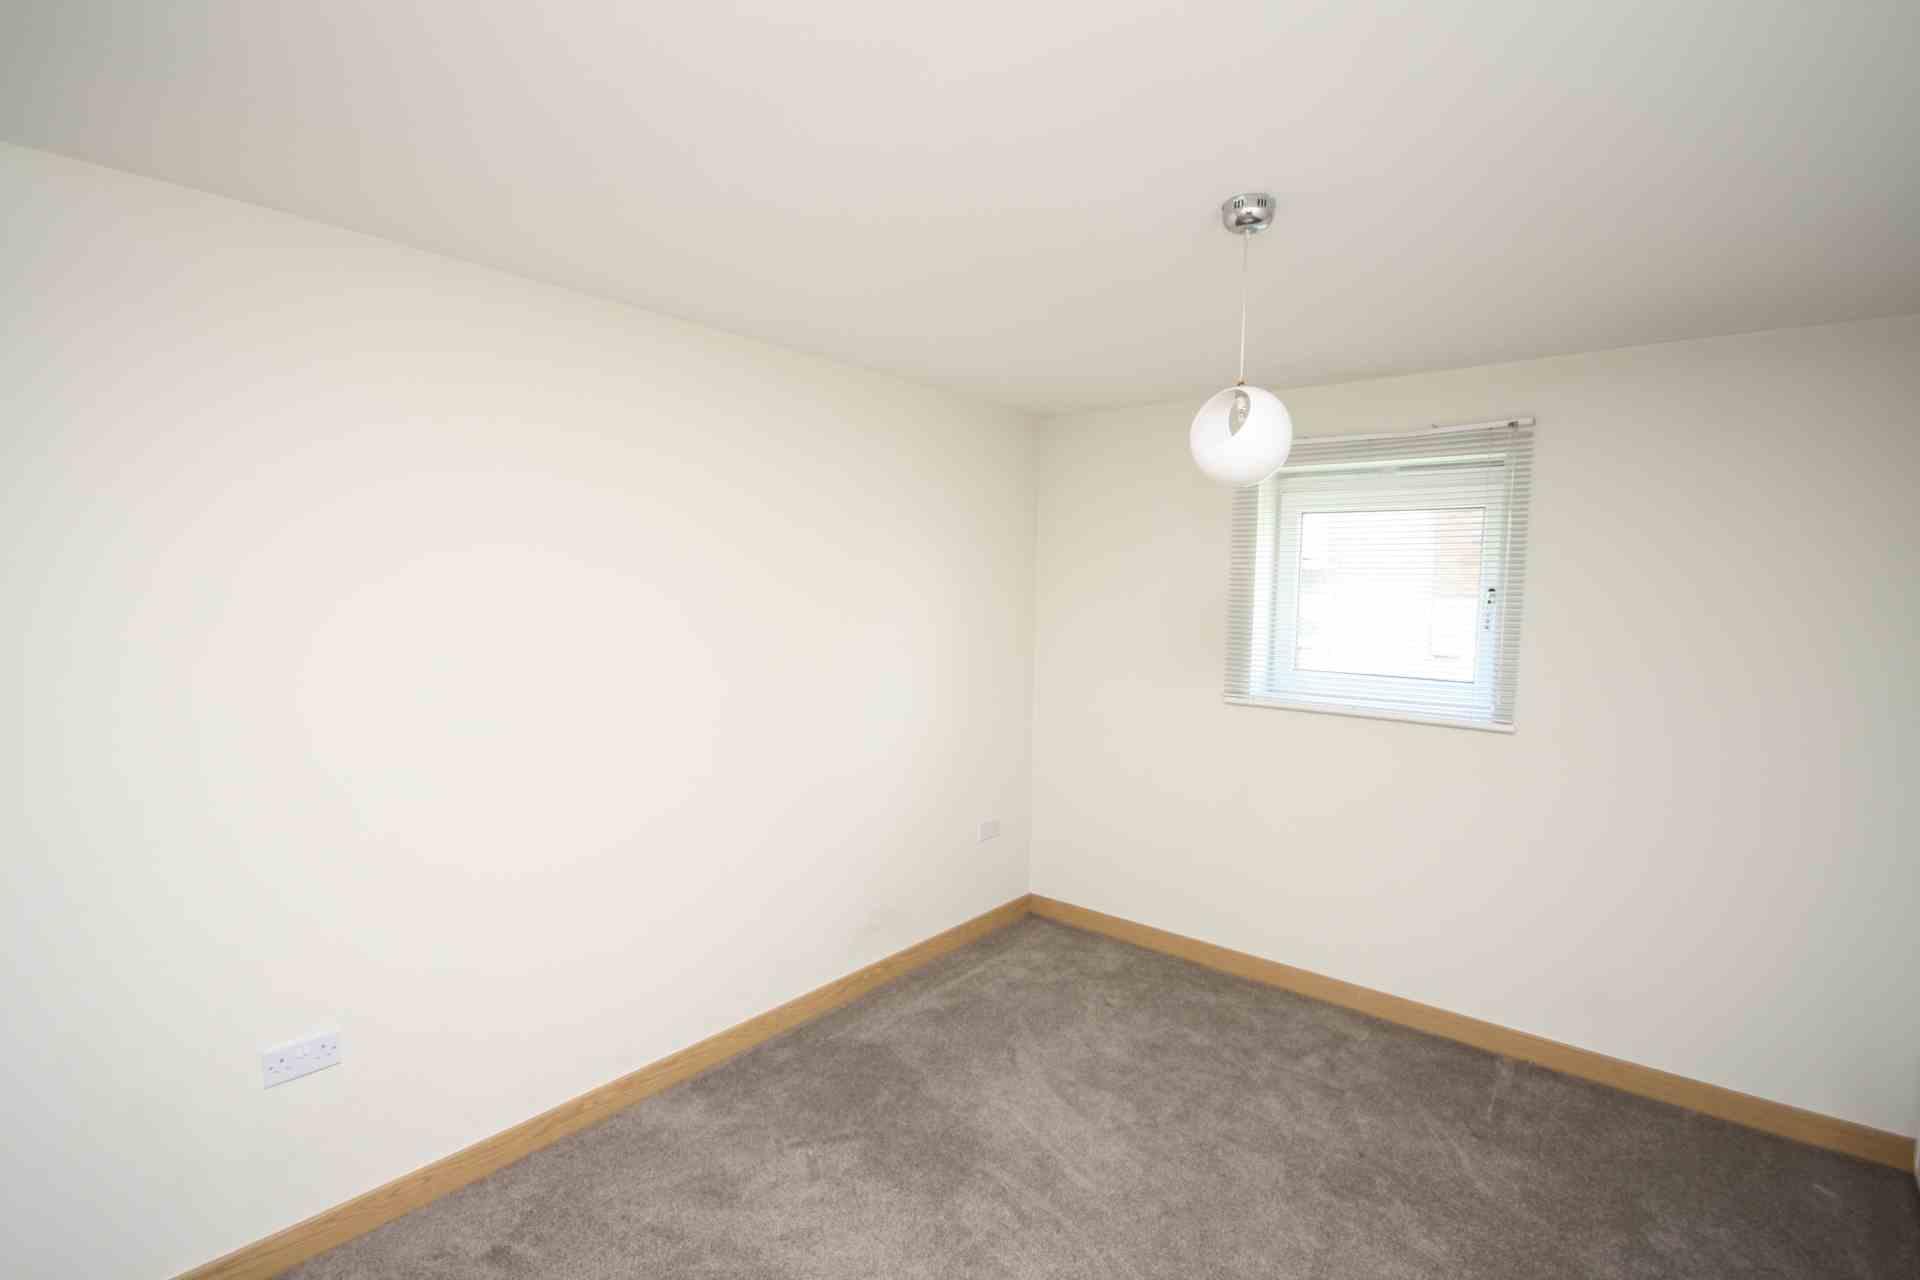 2 Bedroom Apartment To Rent Morello Quarter Cherrydown